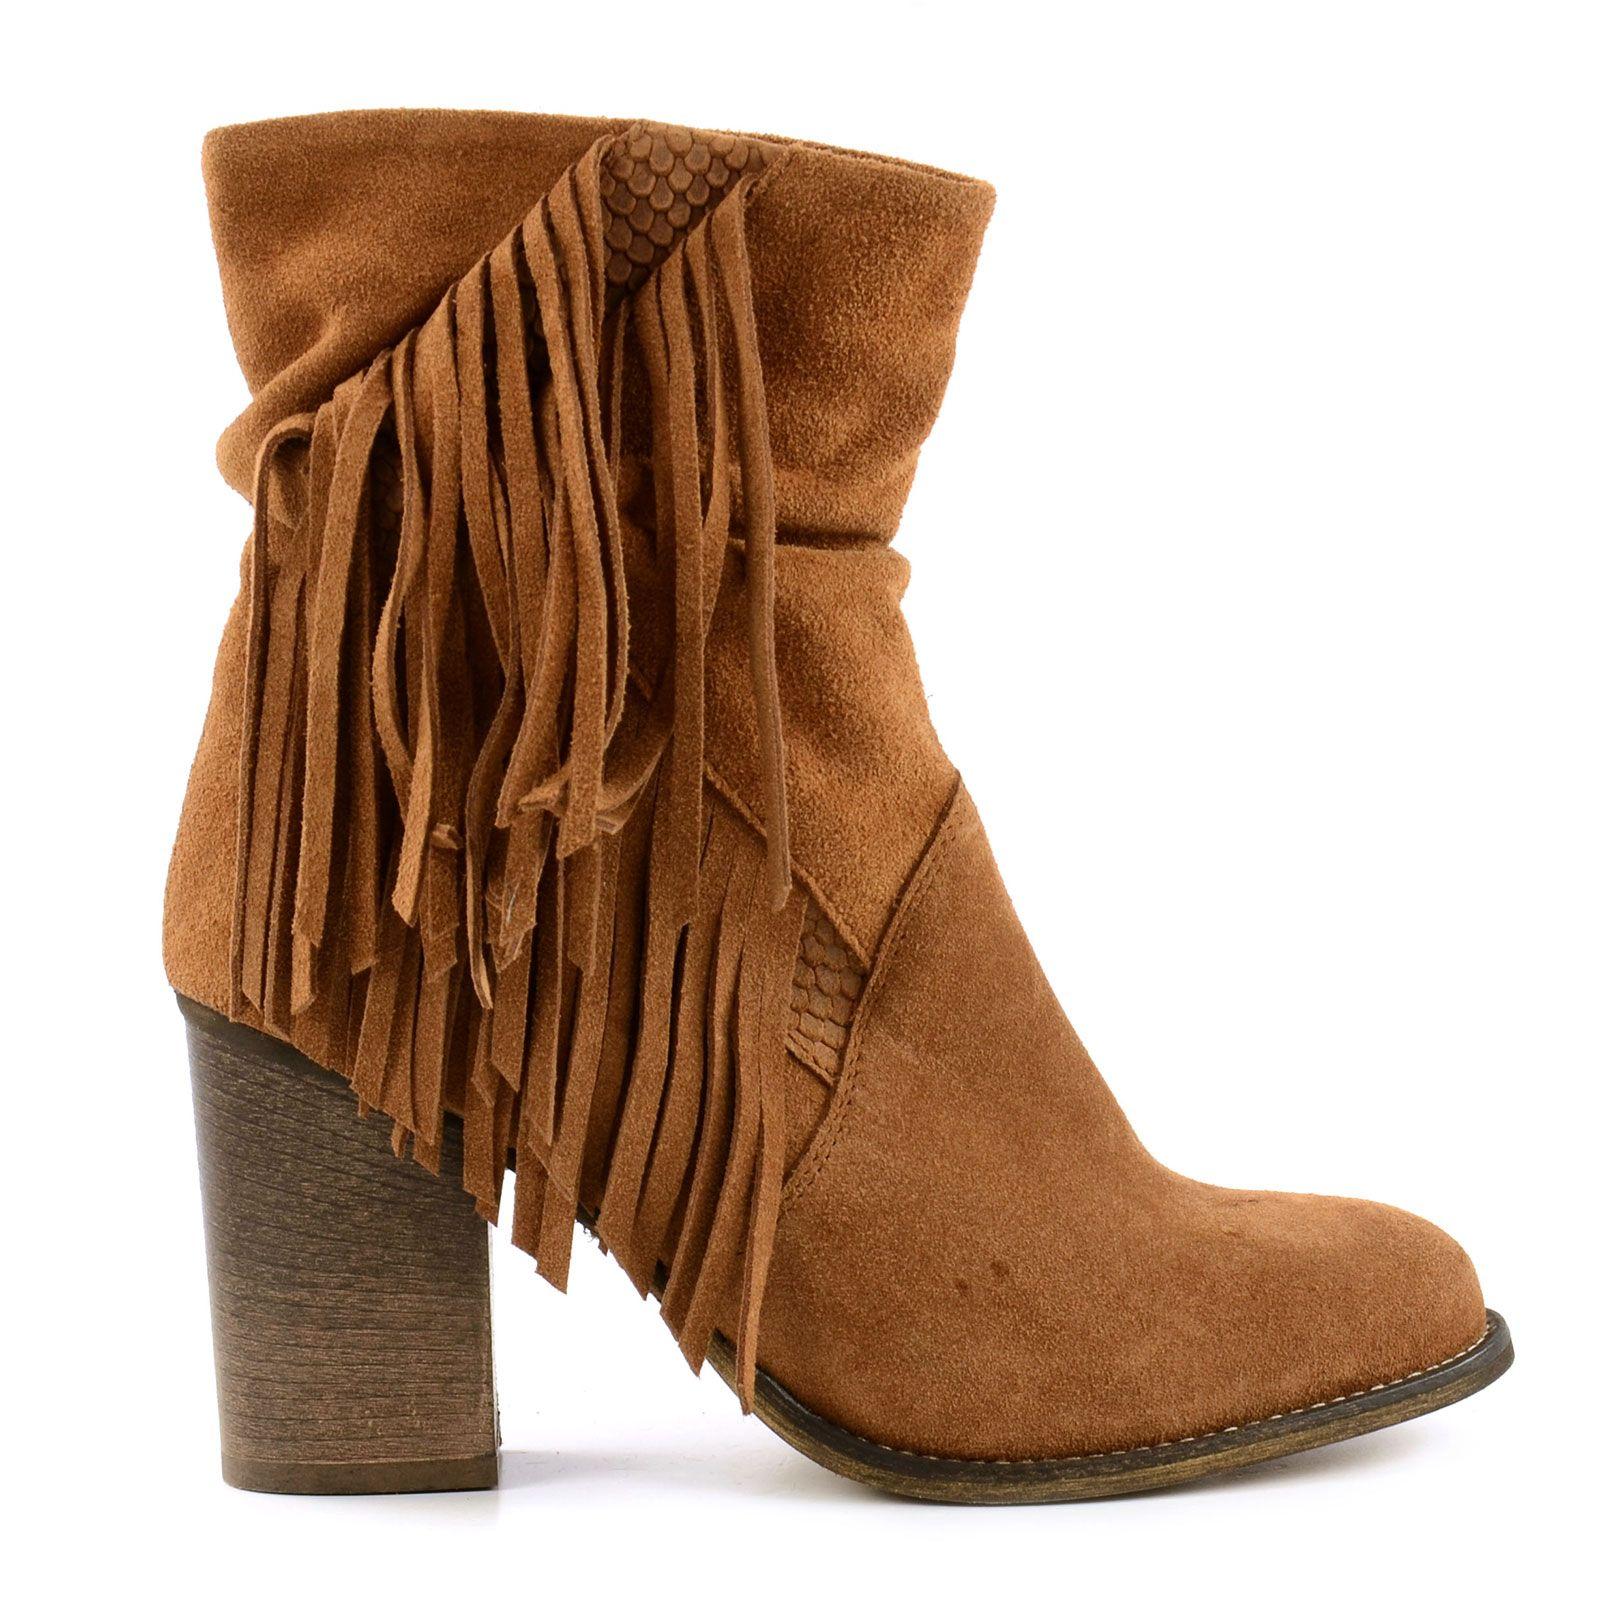 Cognac fringe boots - Cognac franje laarzen | Fringe boots ...